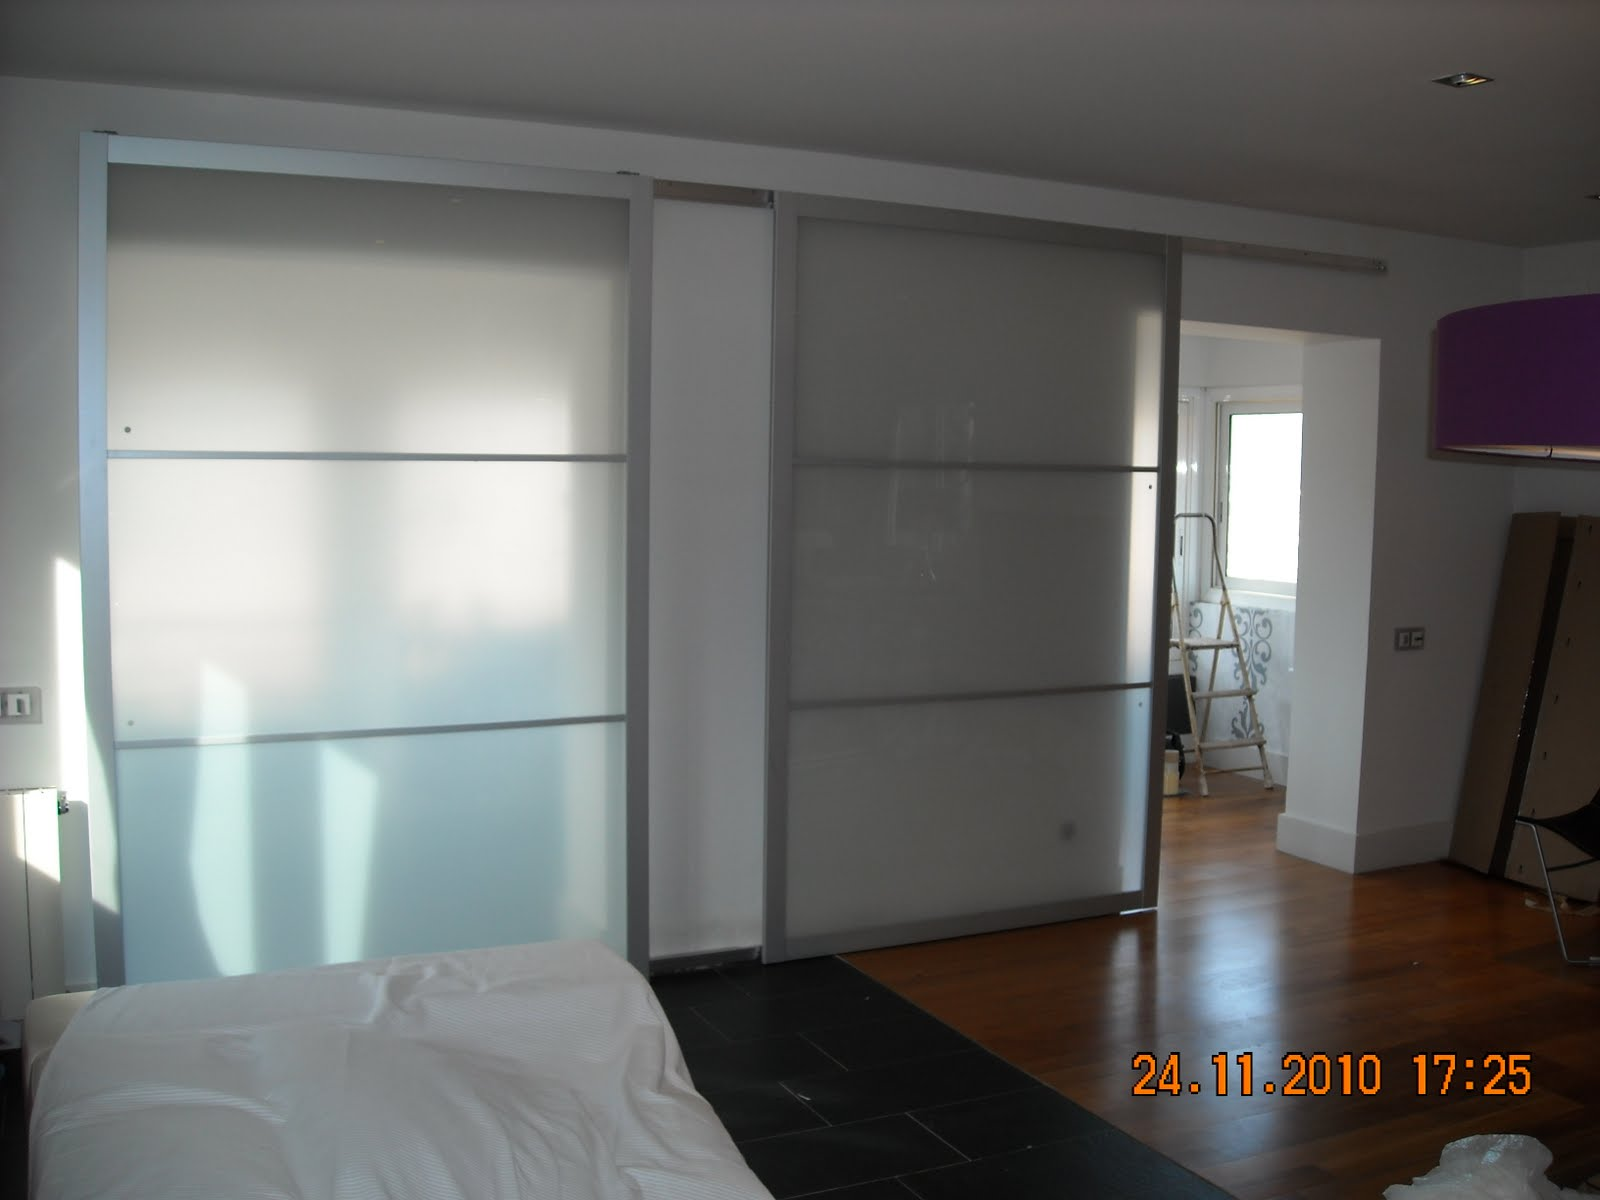 Bricolatge a domicili puerta corredera ikea lyngdal for Armario 2 puertas ikea